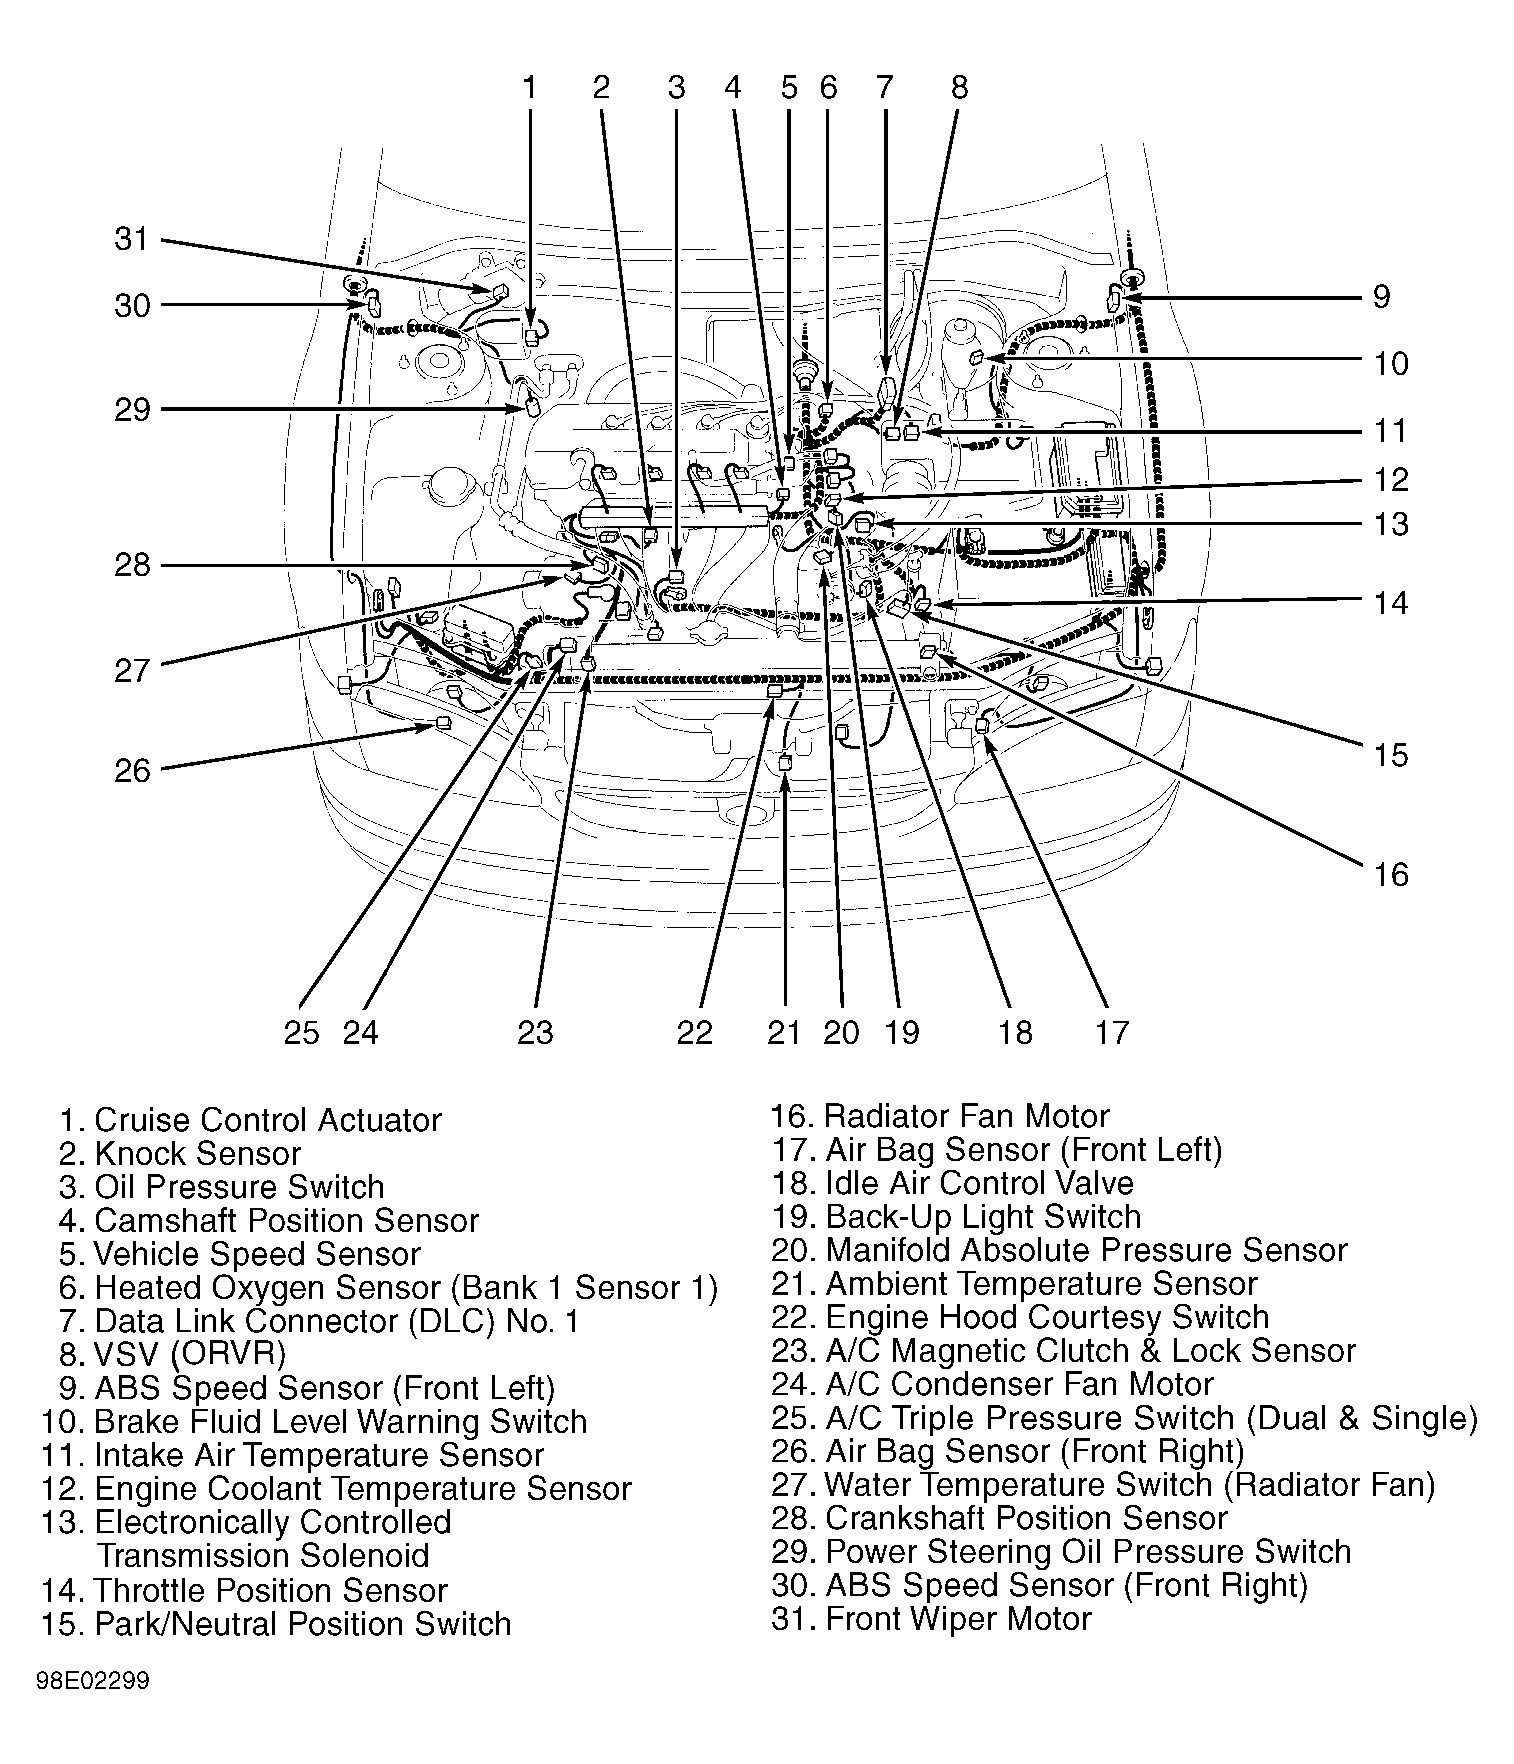 2010 toyota Corolla Parts Diagram toyota Corolla 2010 Parts Luxury toyota Corolla Olx – Car Parts List